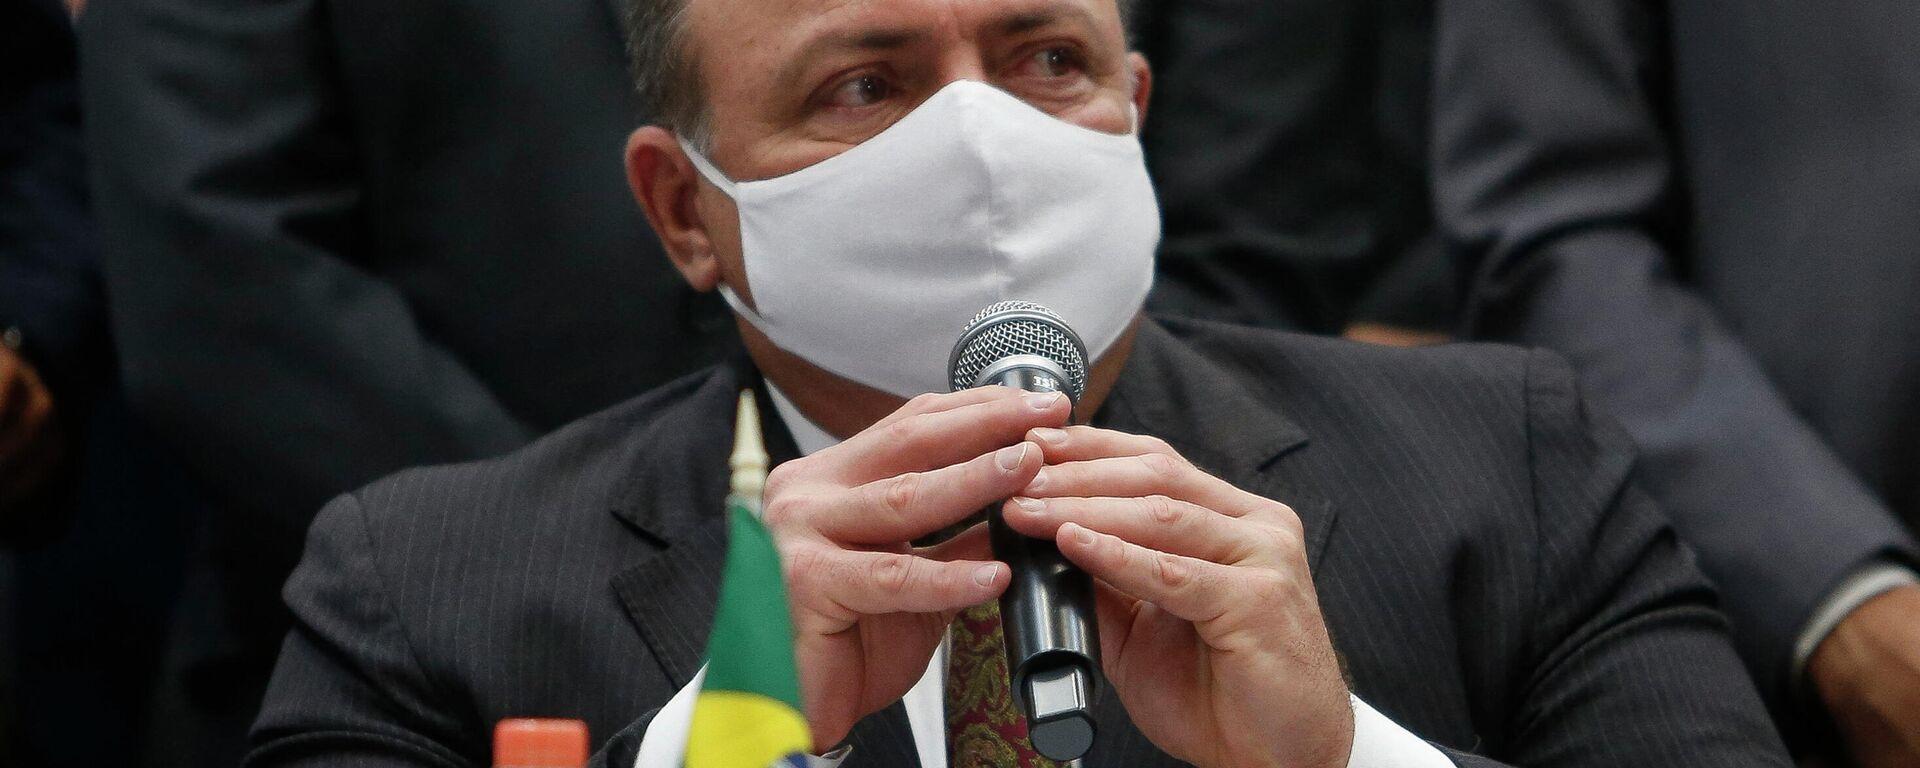 Eduardo Pazuello, ministro de Salud de Brasil - Sputnik Mundo, 1920, 16.07.2021